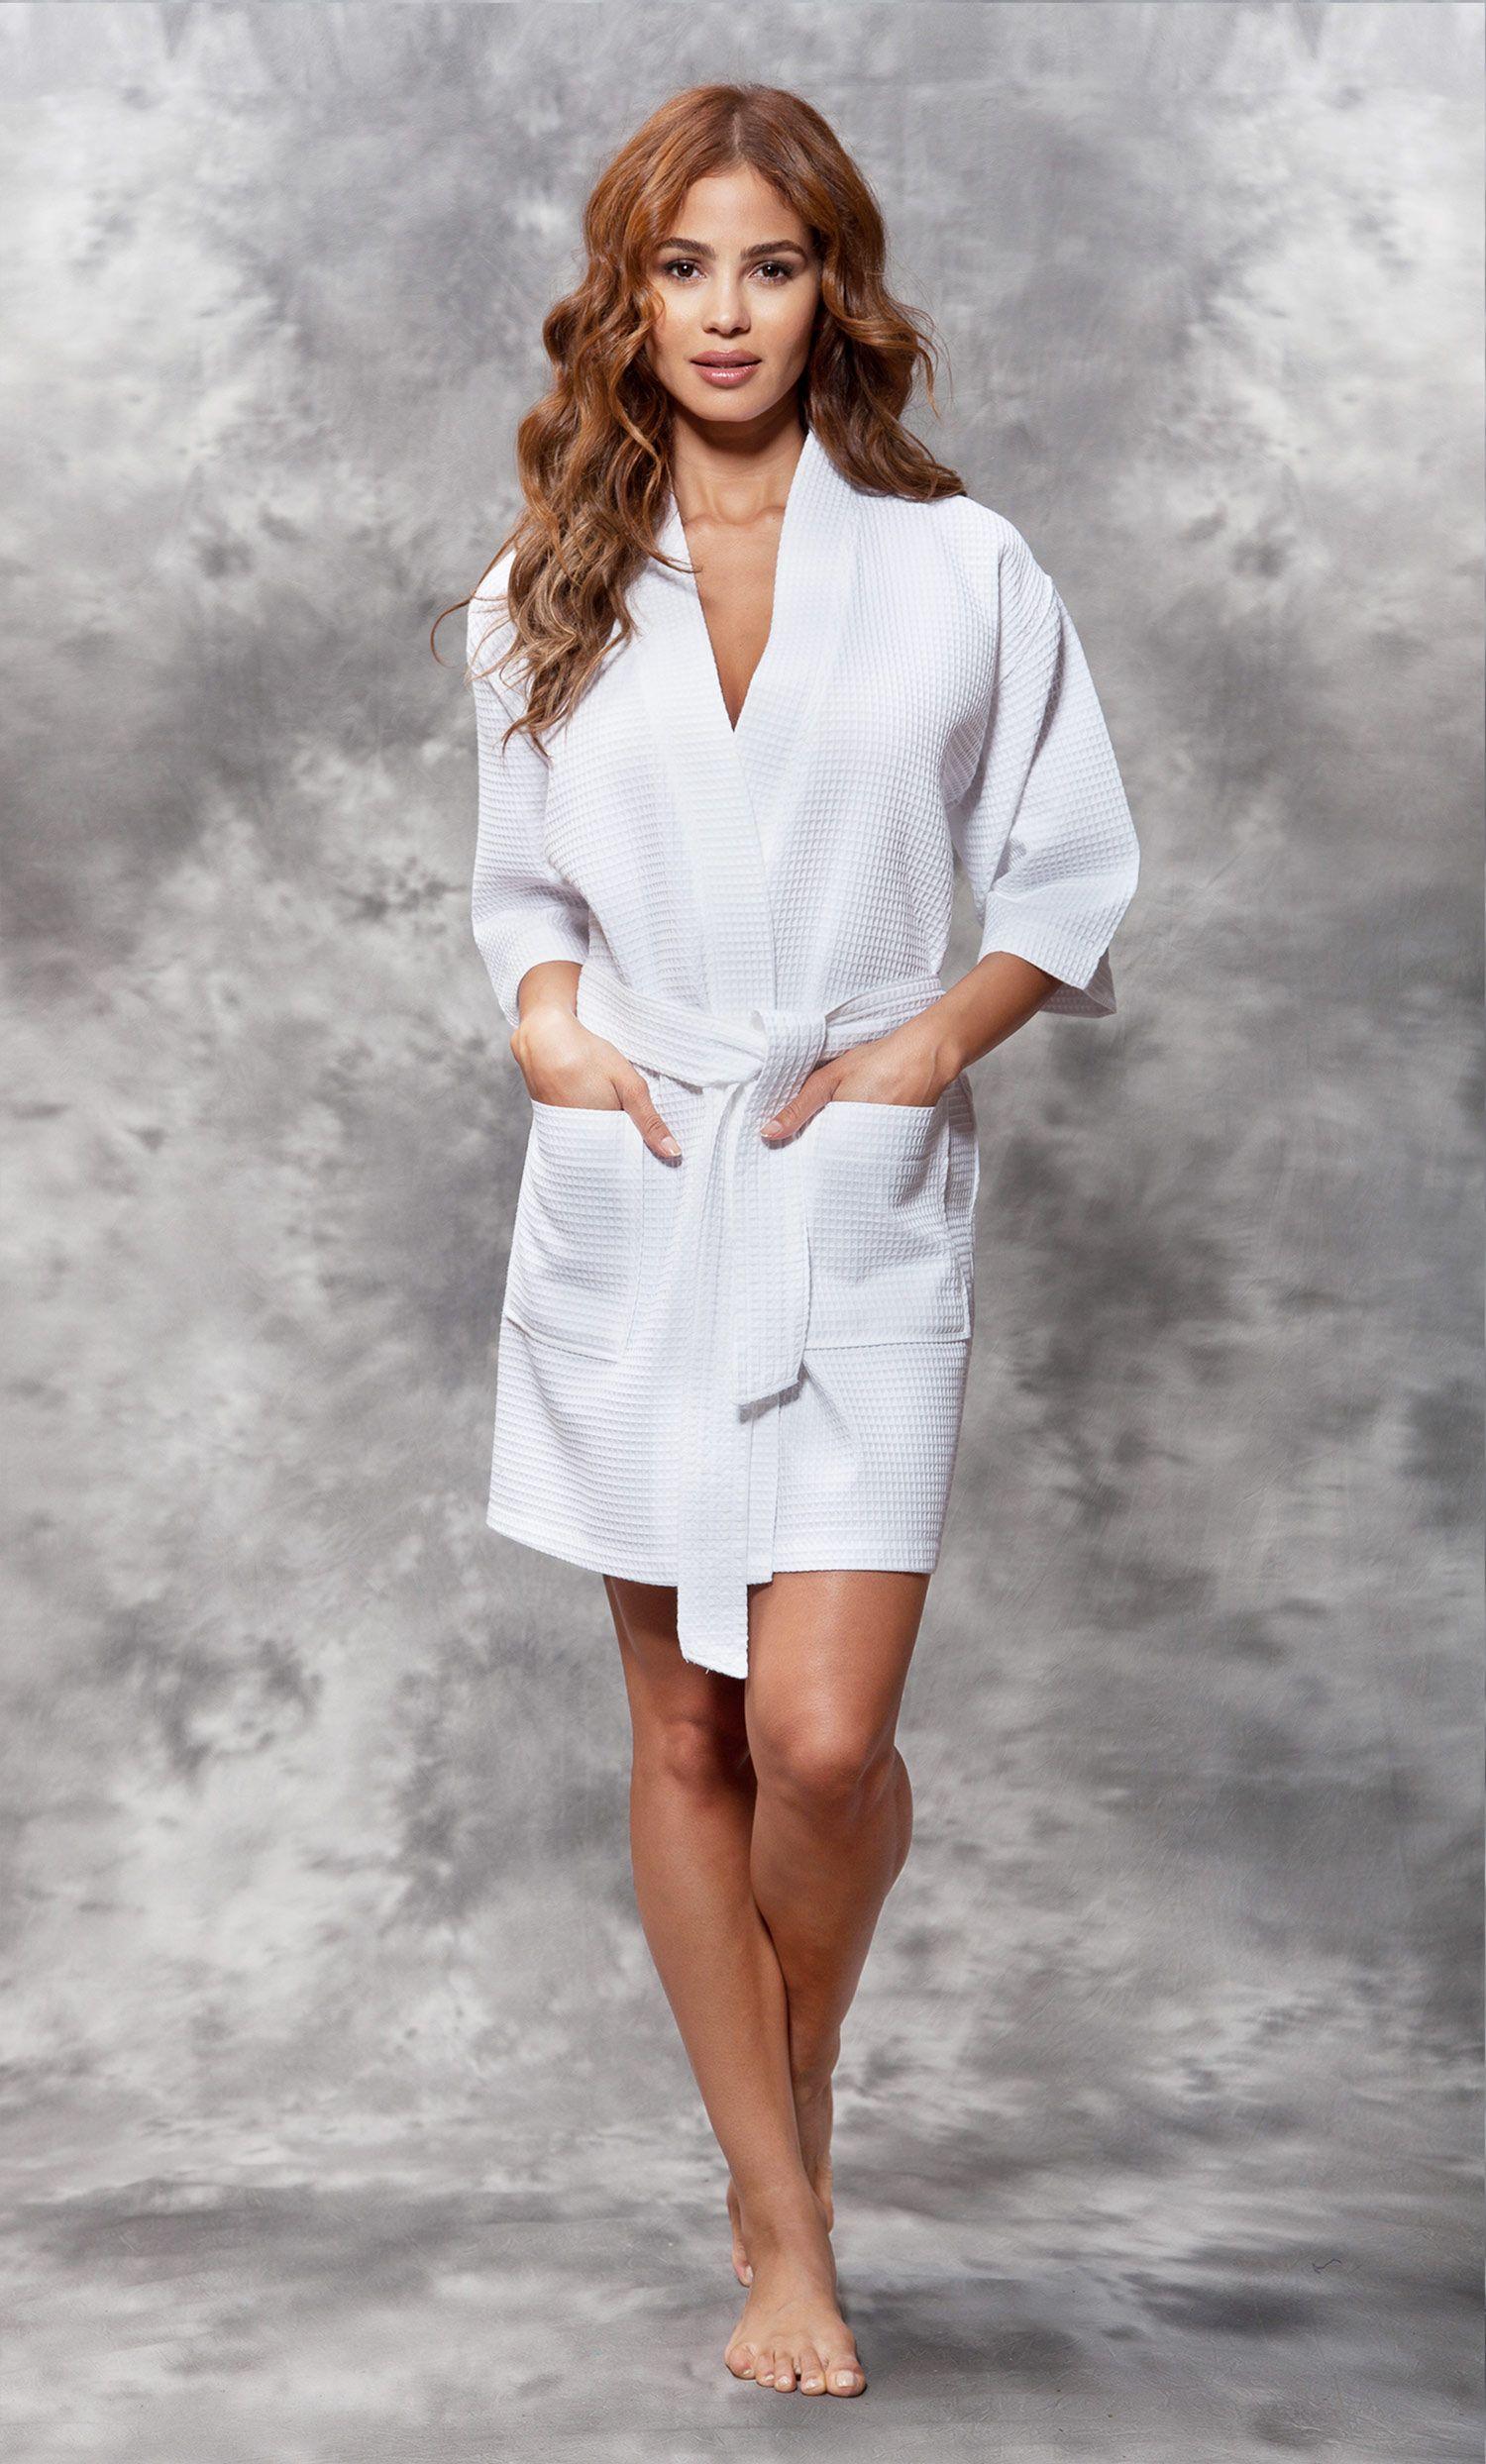 All Bathrobes    Waffle Kimono White Short Robe Square Pattern - Wholesale  bathrobes cba439cd5